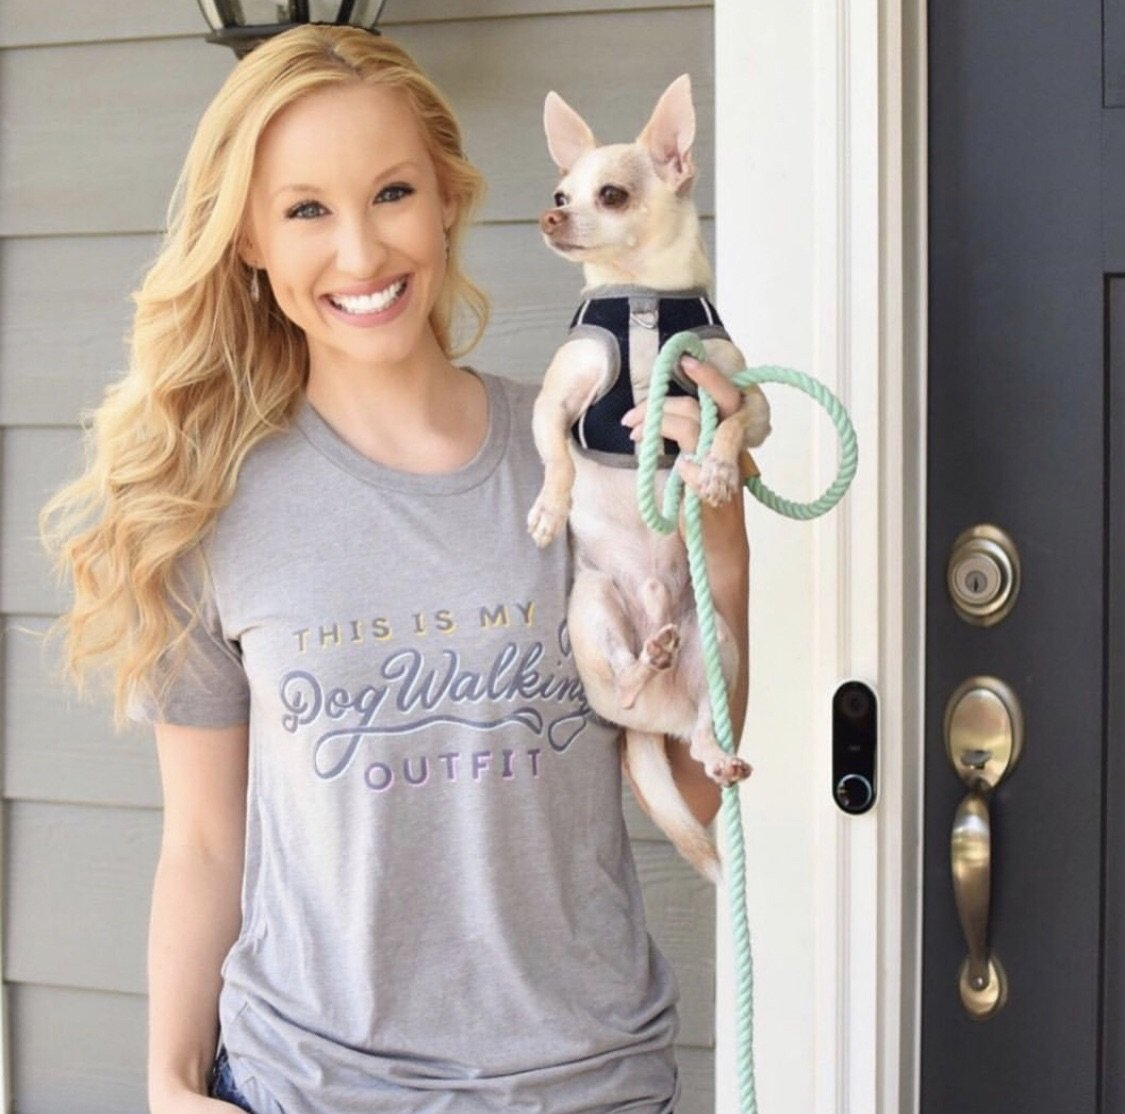 smiling woman holding dog